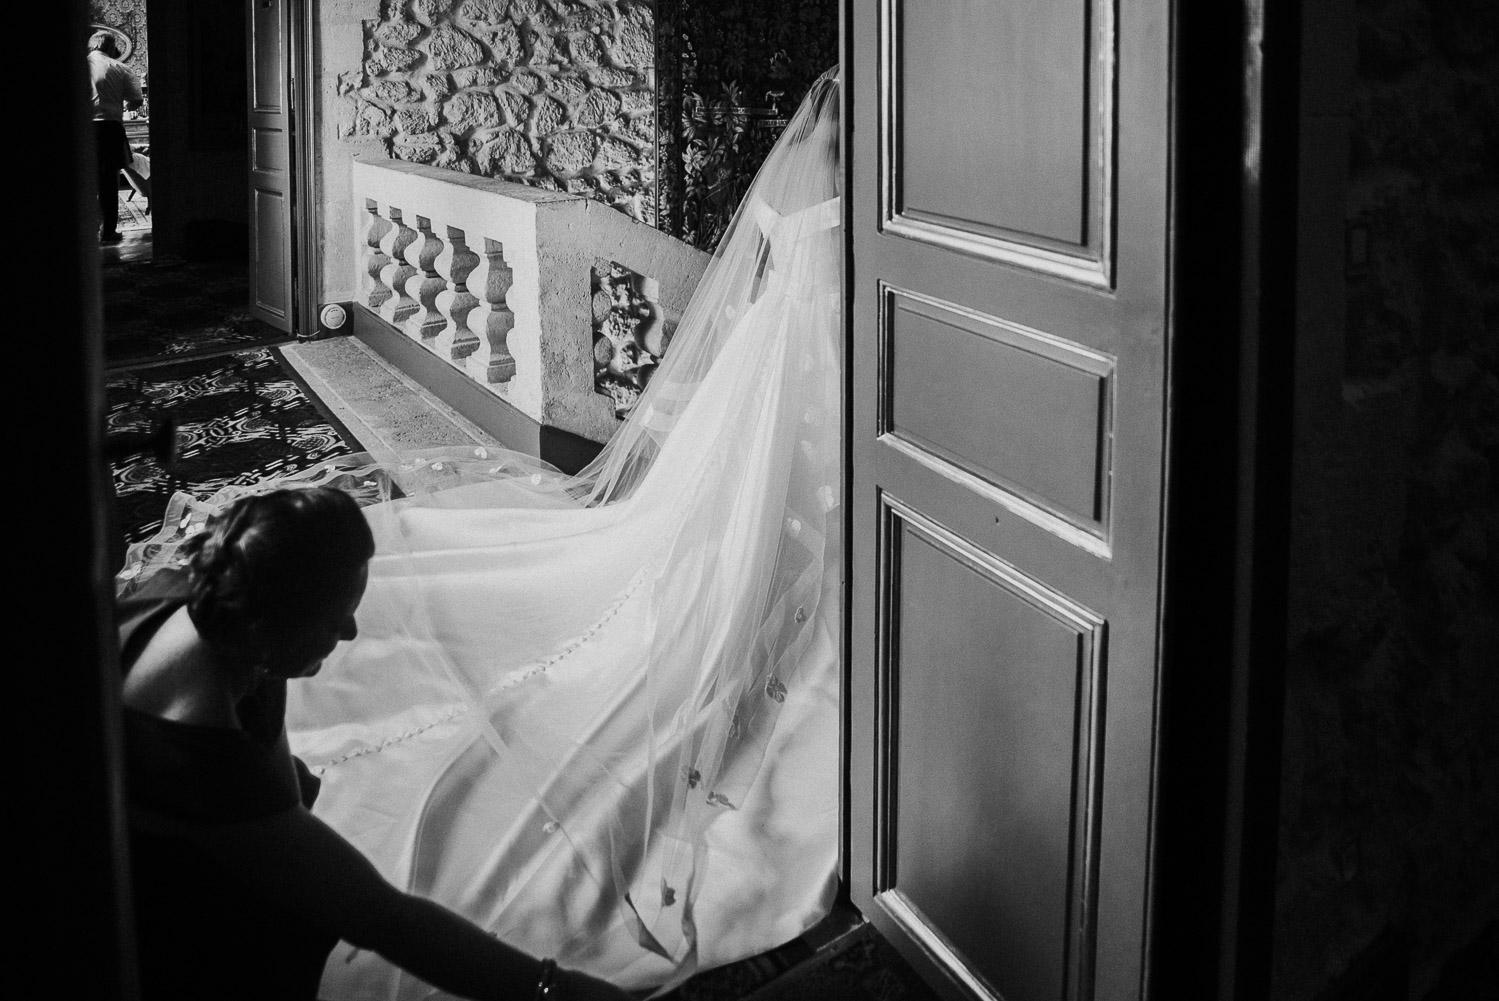 gascony_bordeaux_south_west_france_wedding_tarn_katy_webb_photography_UK49